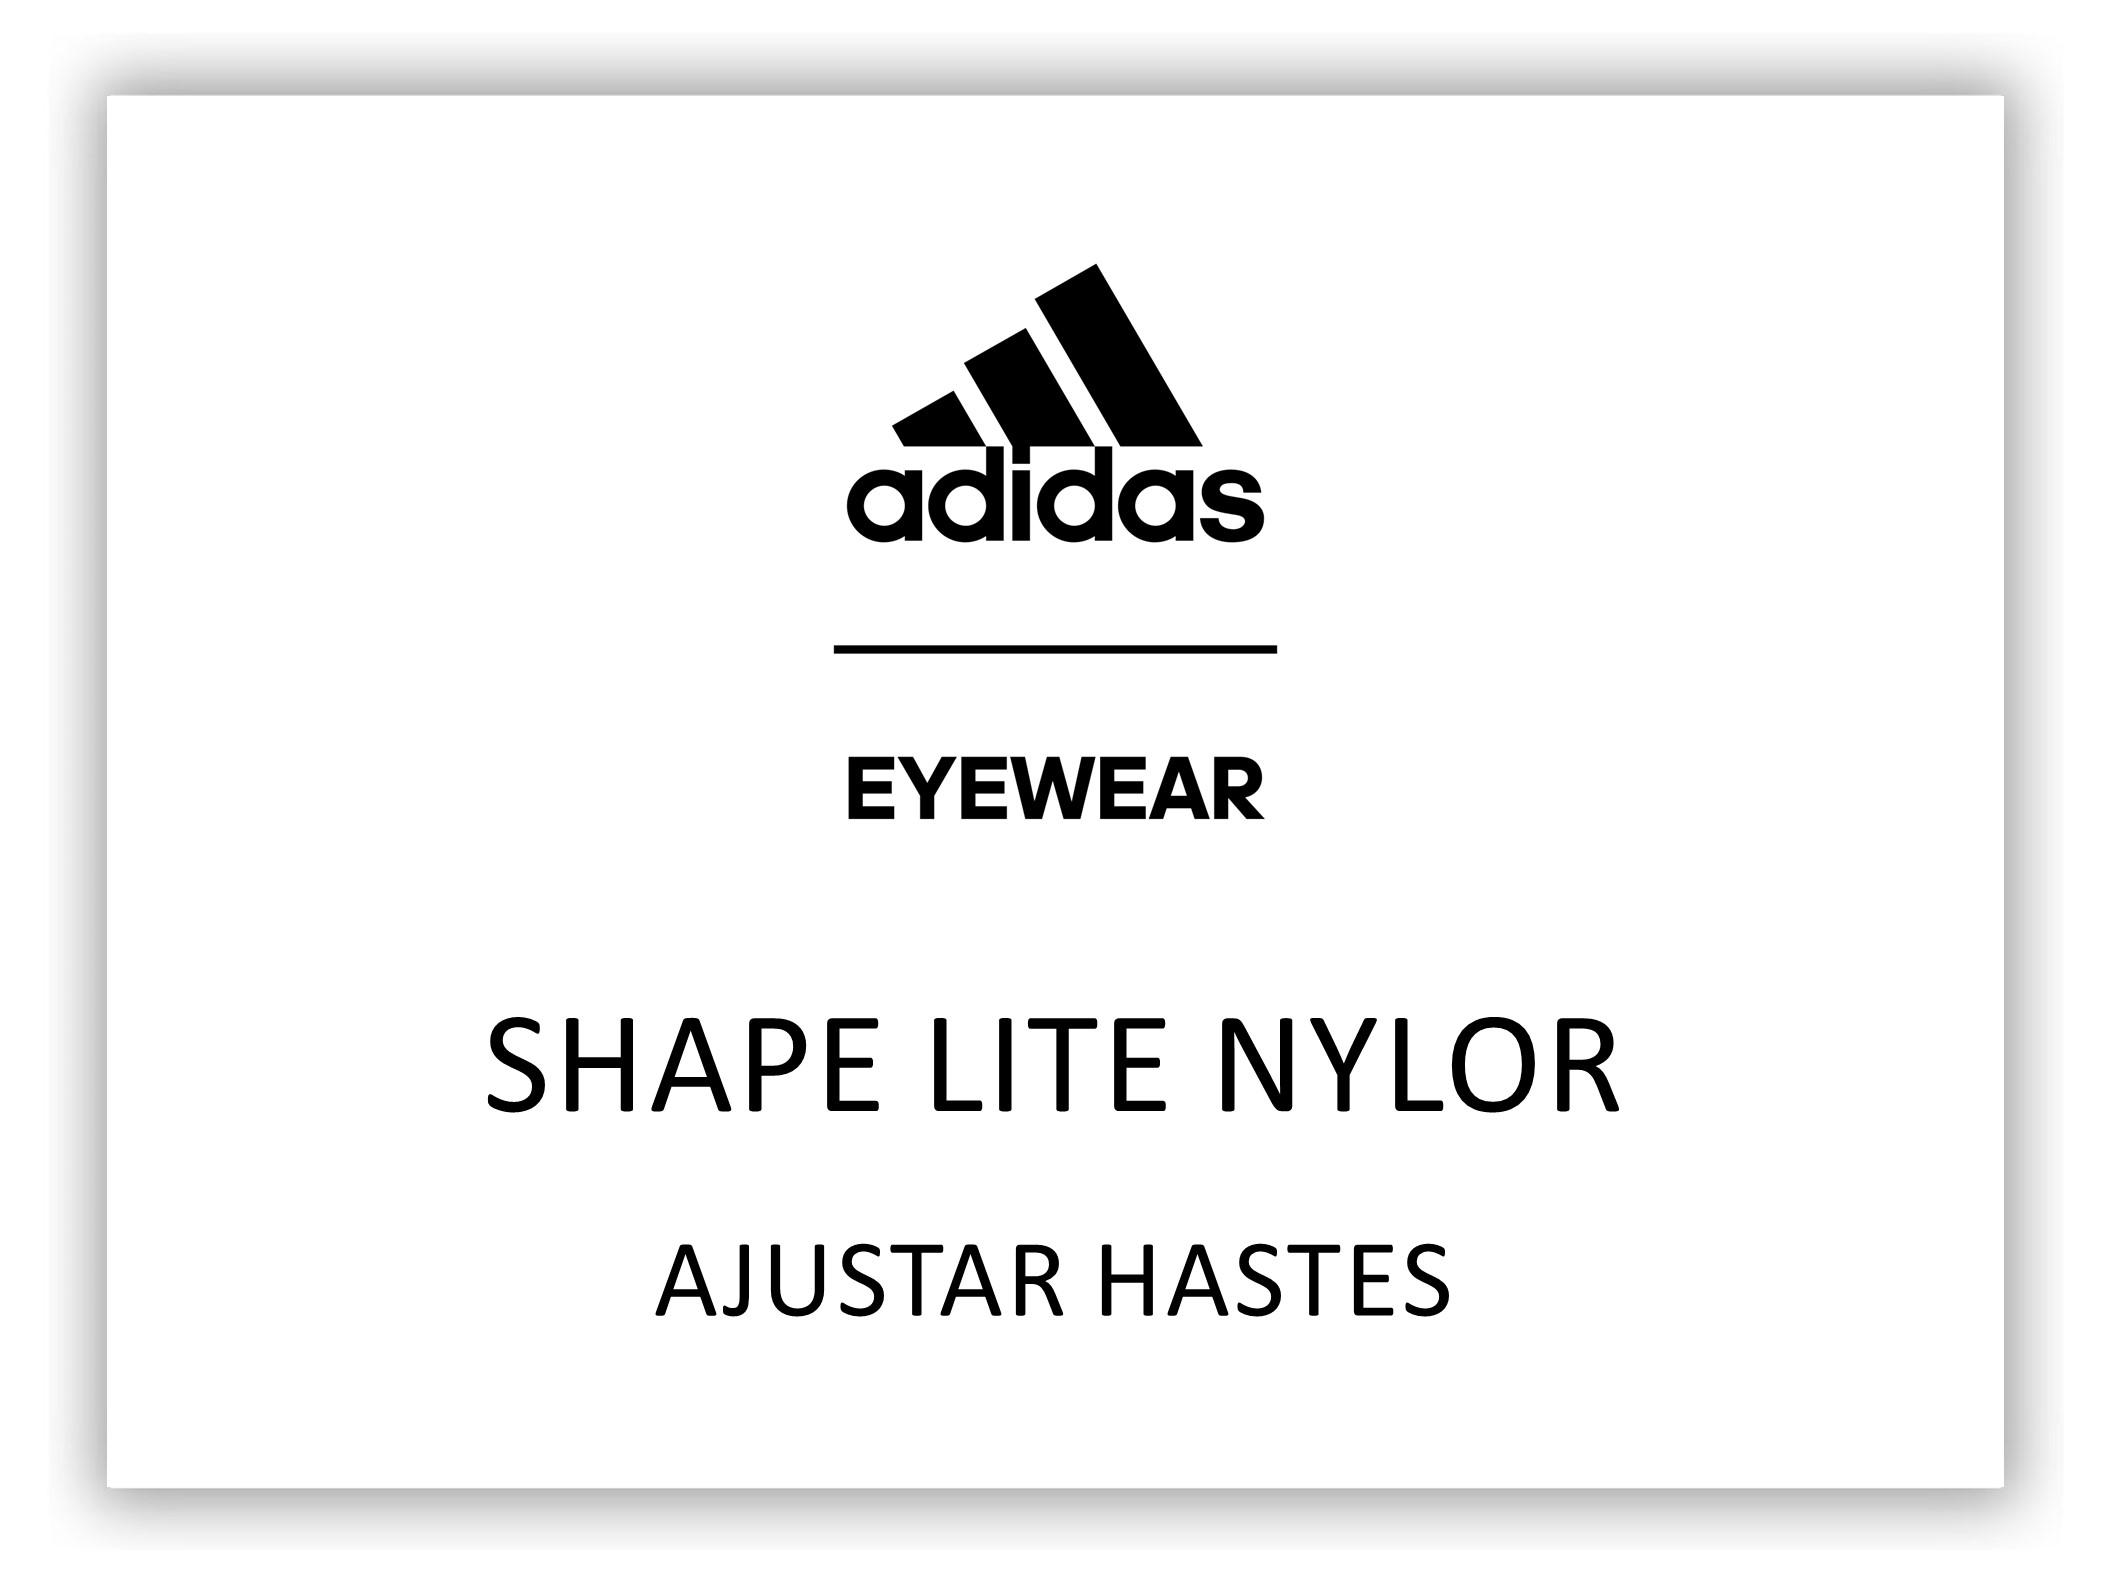 Adidas_capa-Shape Lite nylor-HASTES